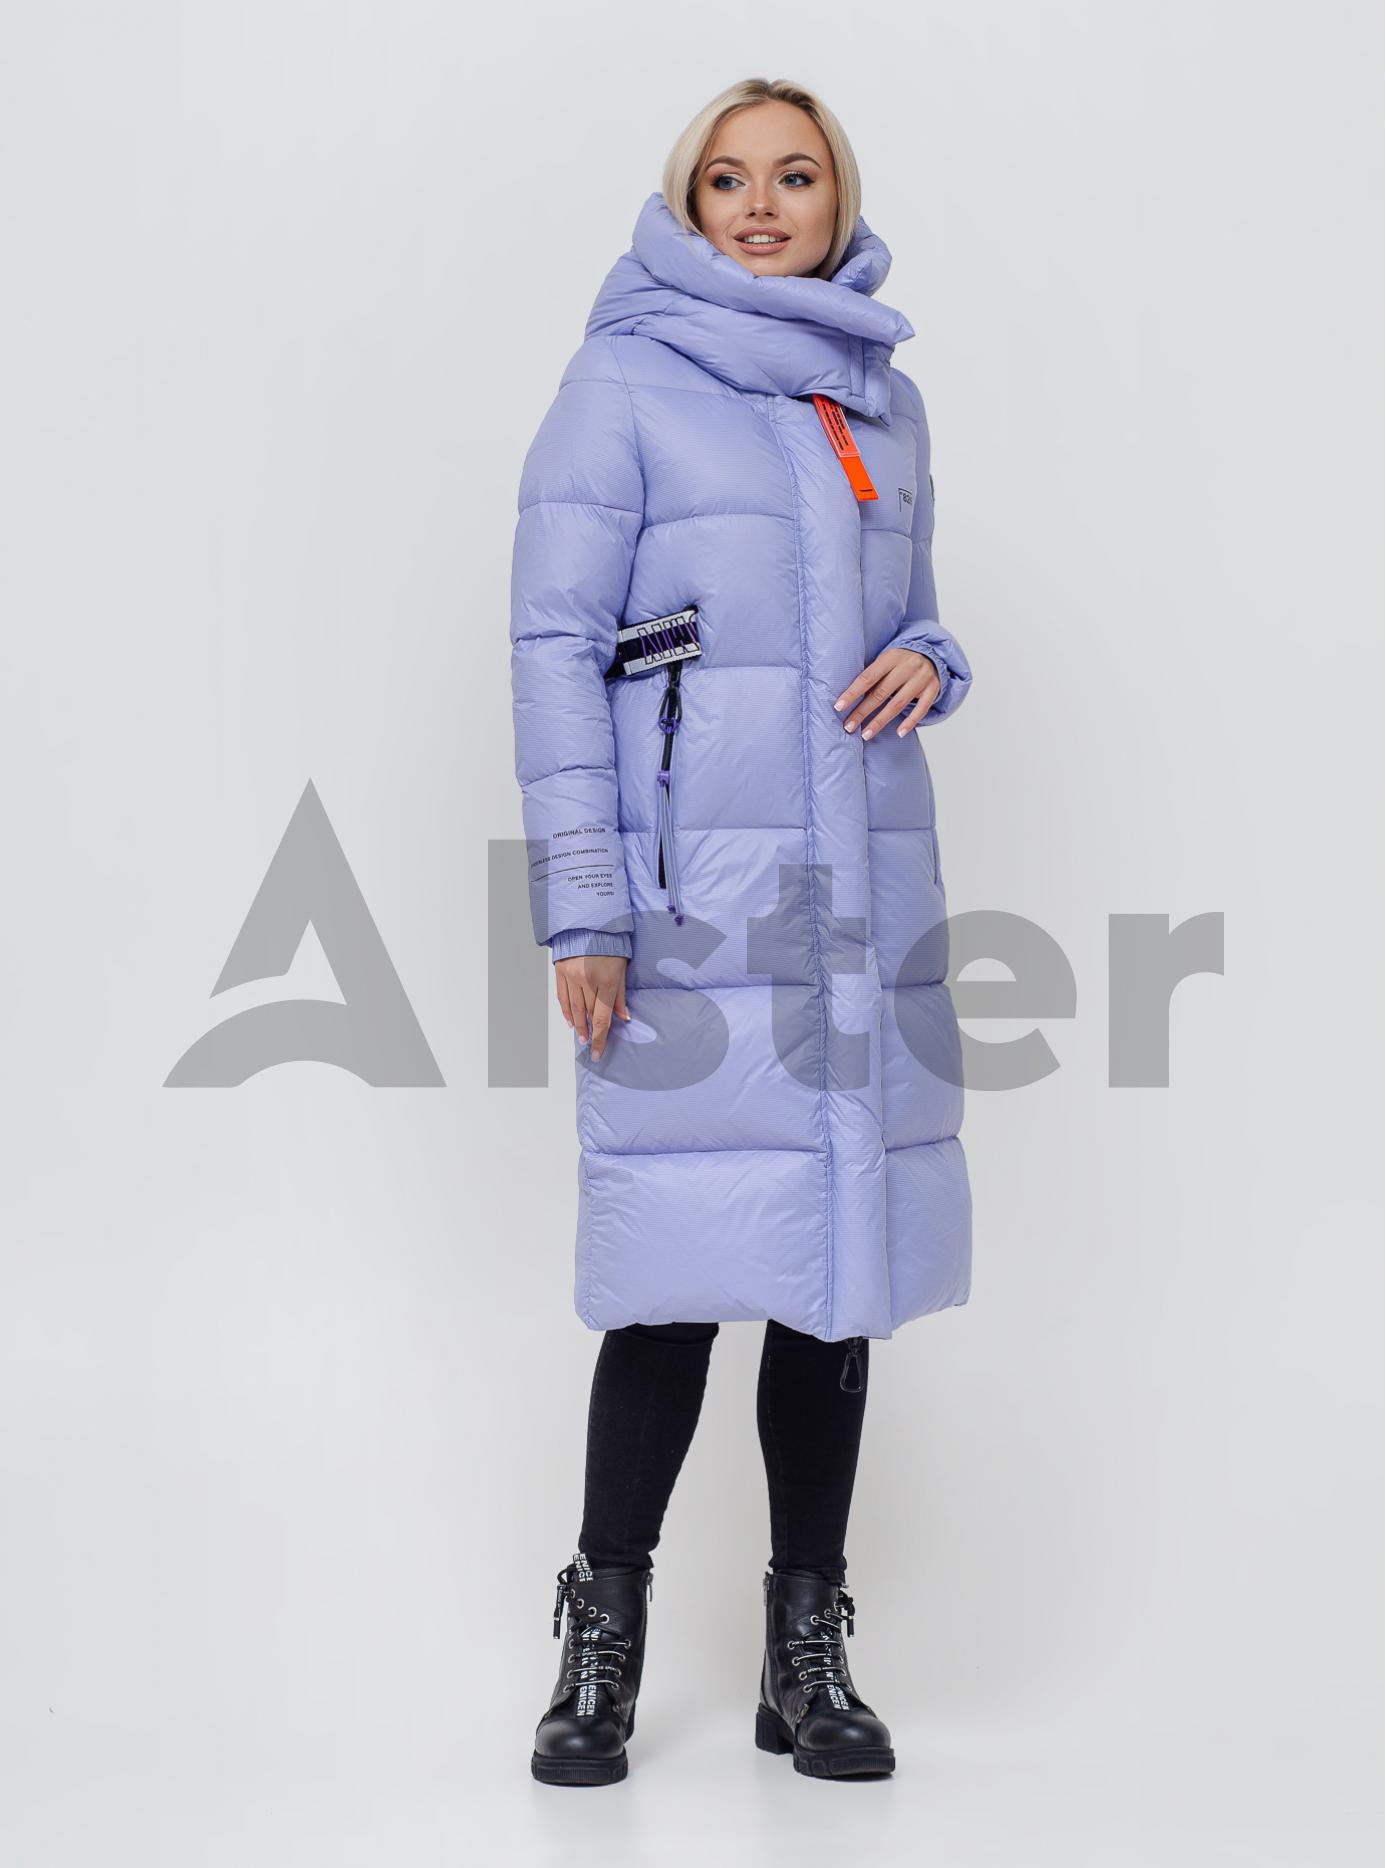 Пуховик женский со съемным капюшоном Лаванда S (06-KL201151): фото - Alster.ua